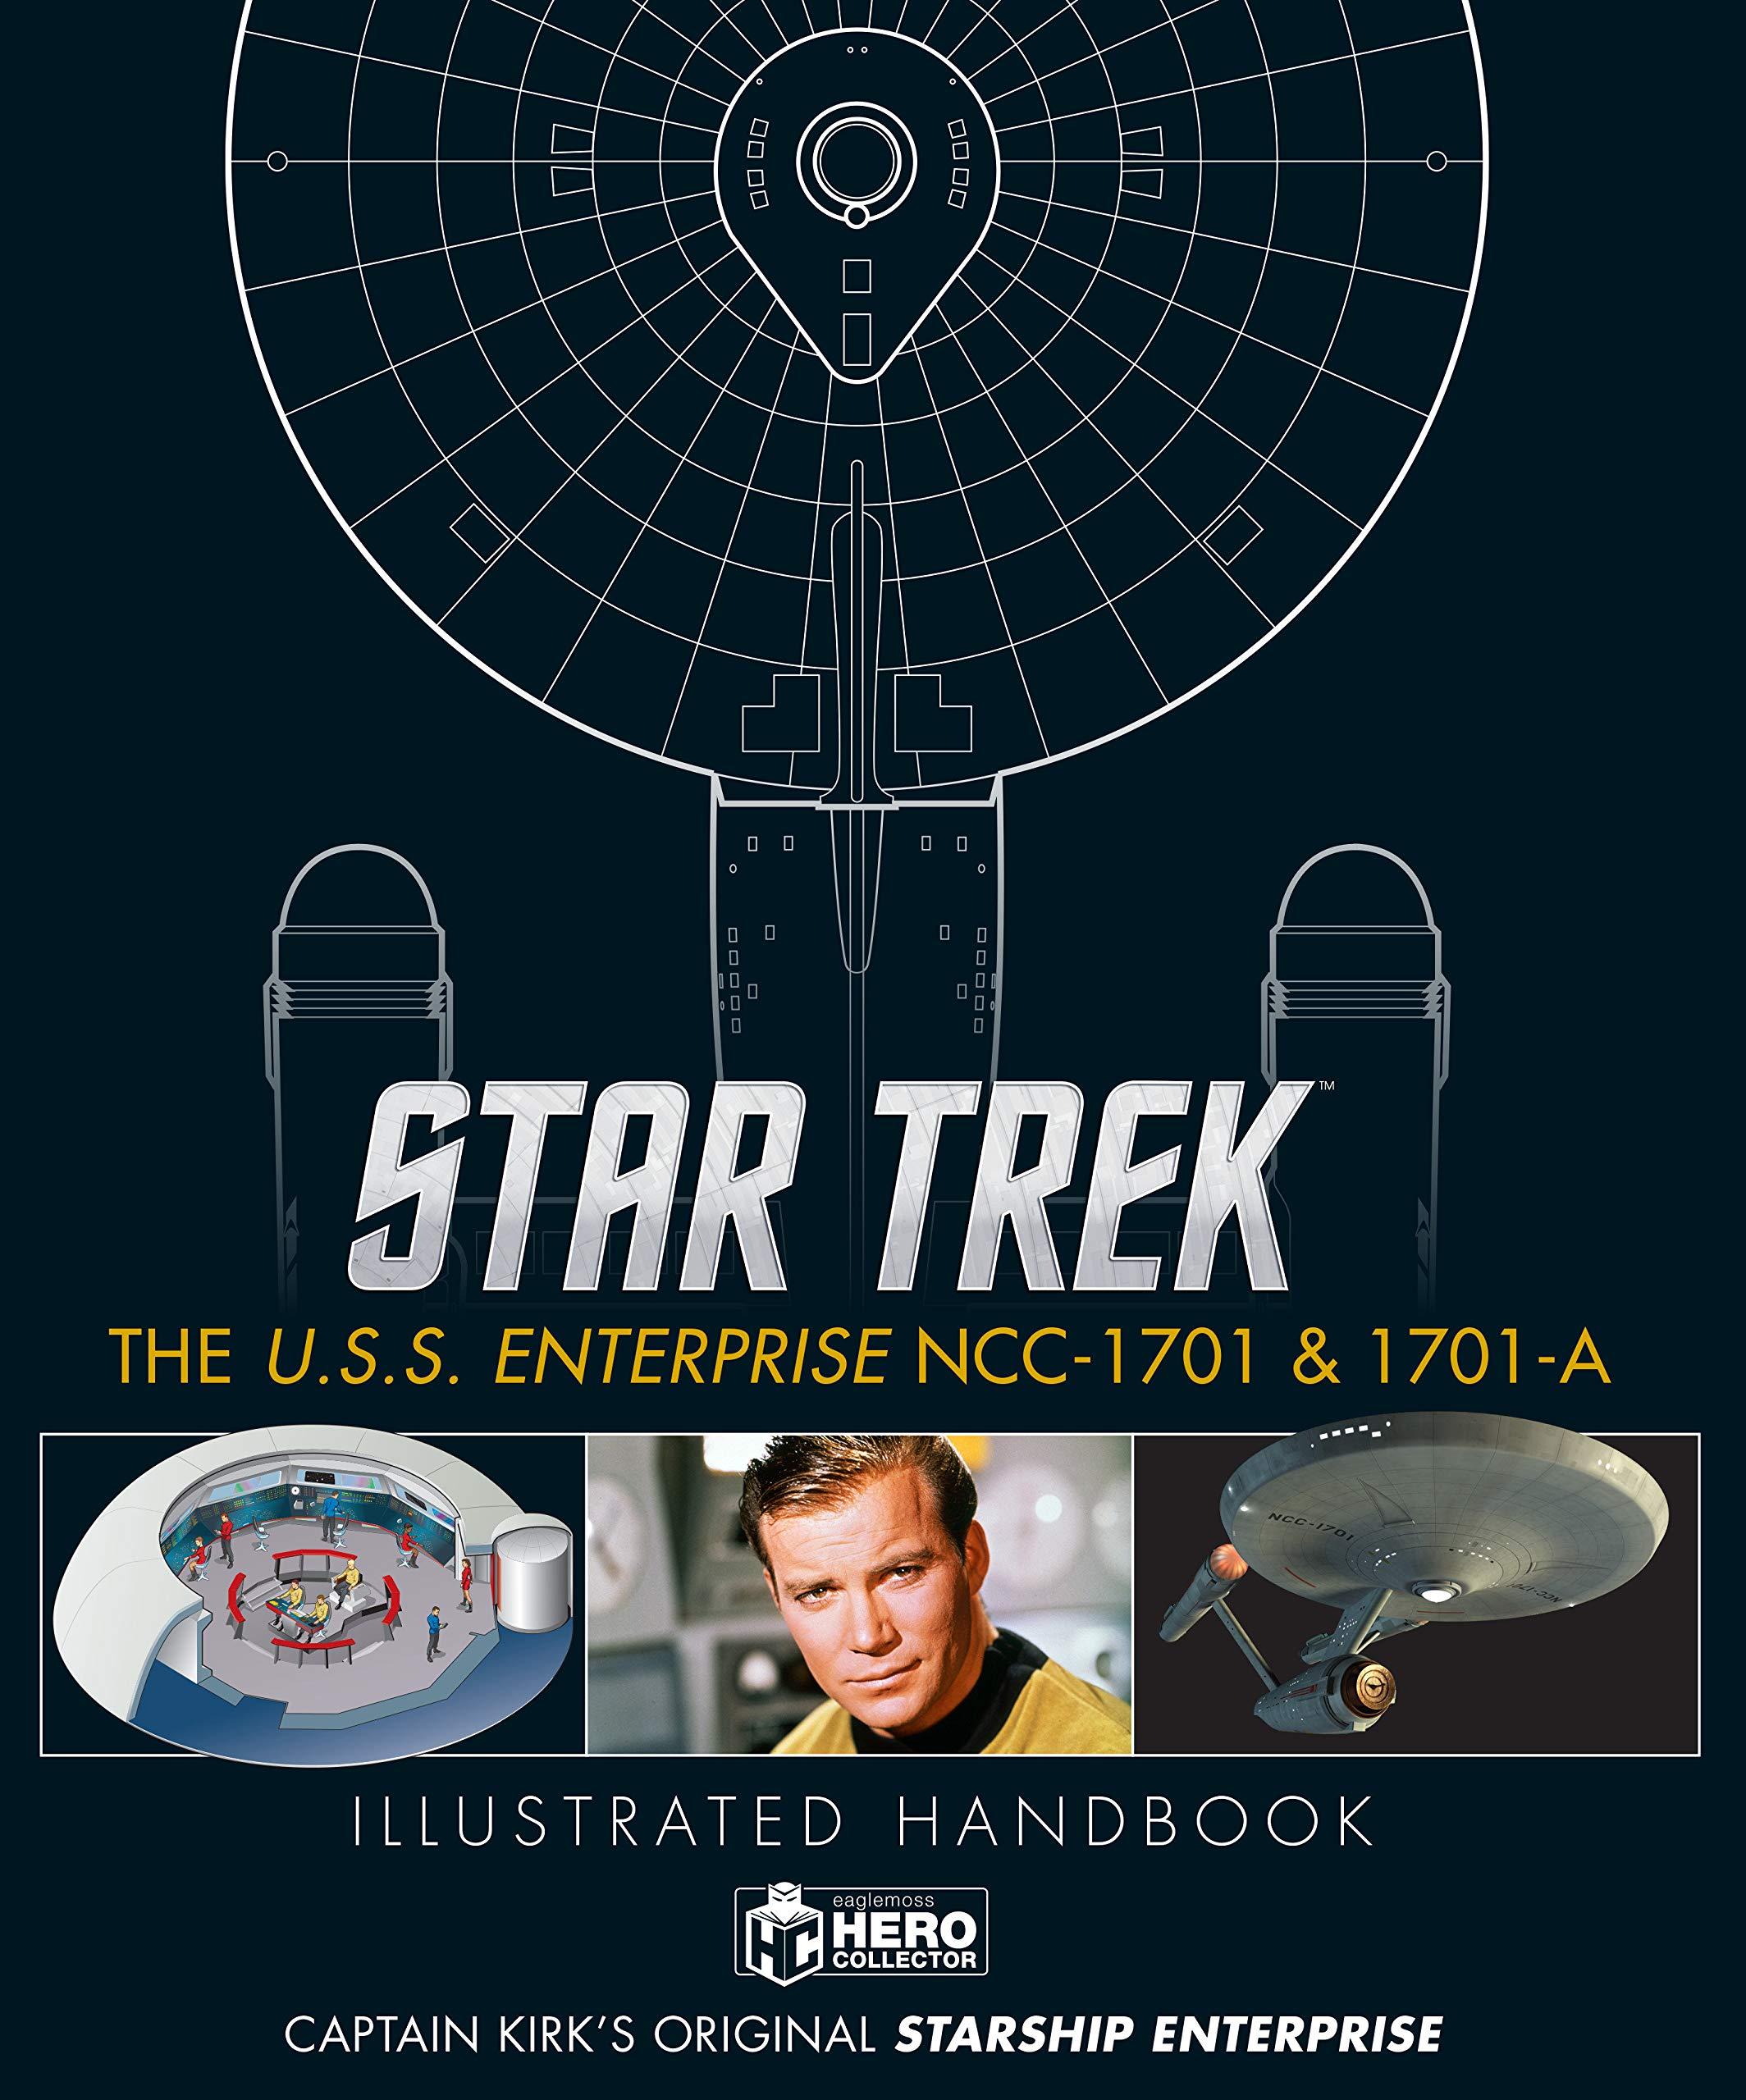 Star Trek: The U.S.S. Enterprise NCC-1701 Illustrated Handbook by Hero Collector